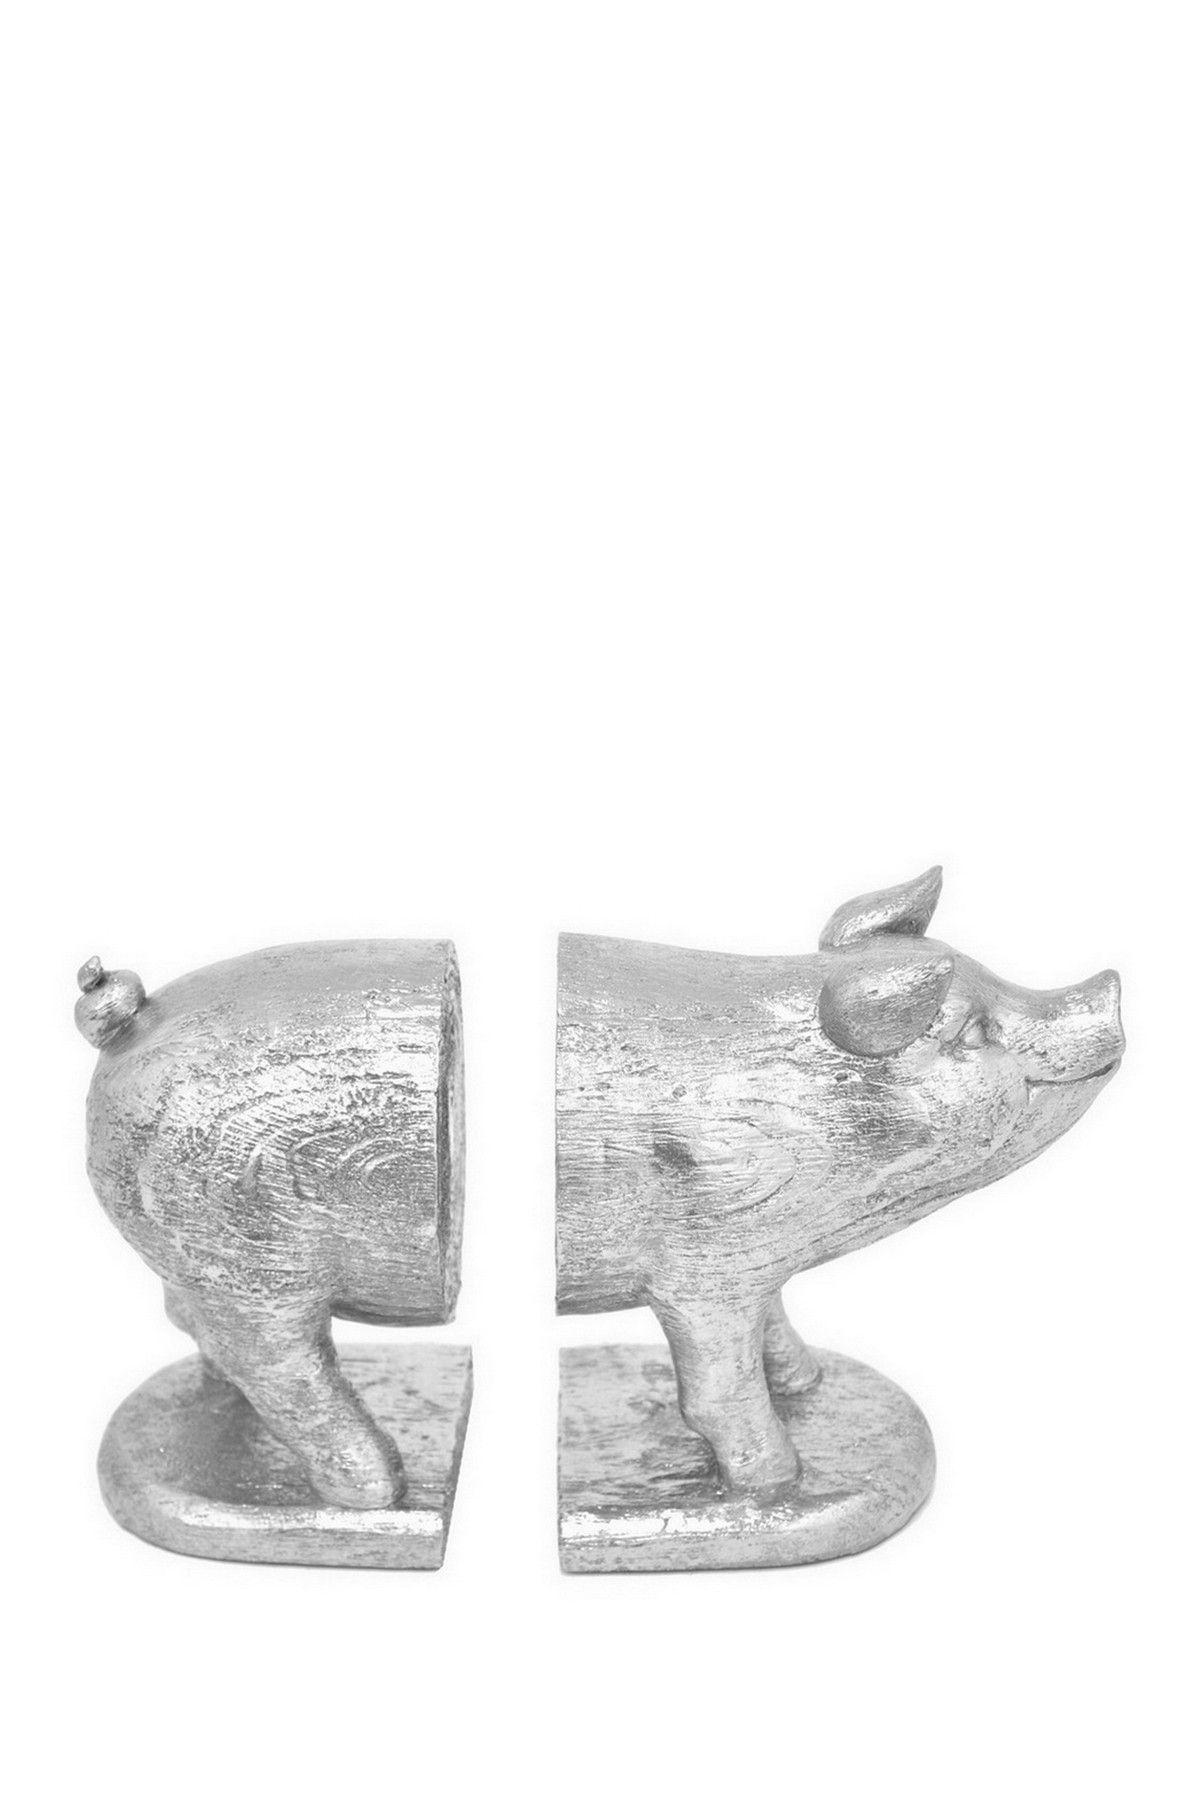 Three Hands | Silver Resin Pig Bookend - Set of 2 | Nordstrom Rack  Sponsored by Nordstrom Rack.